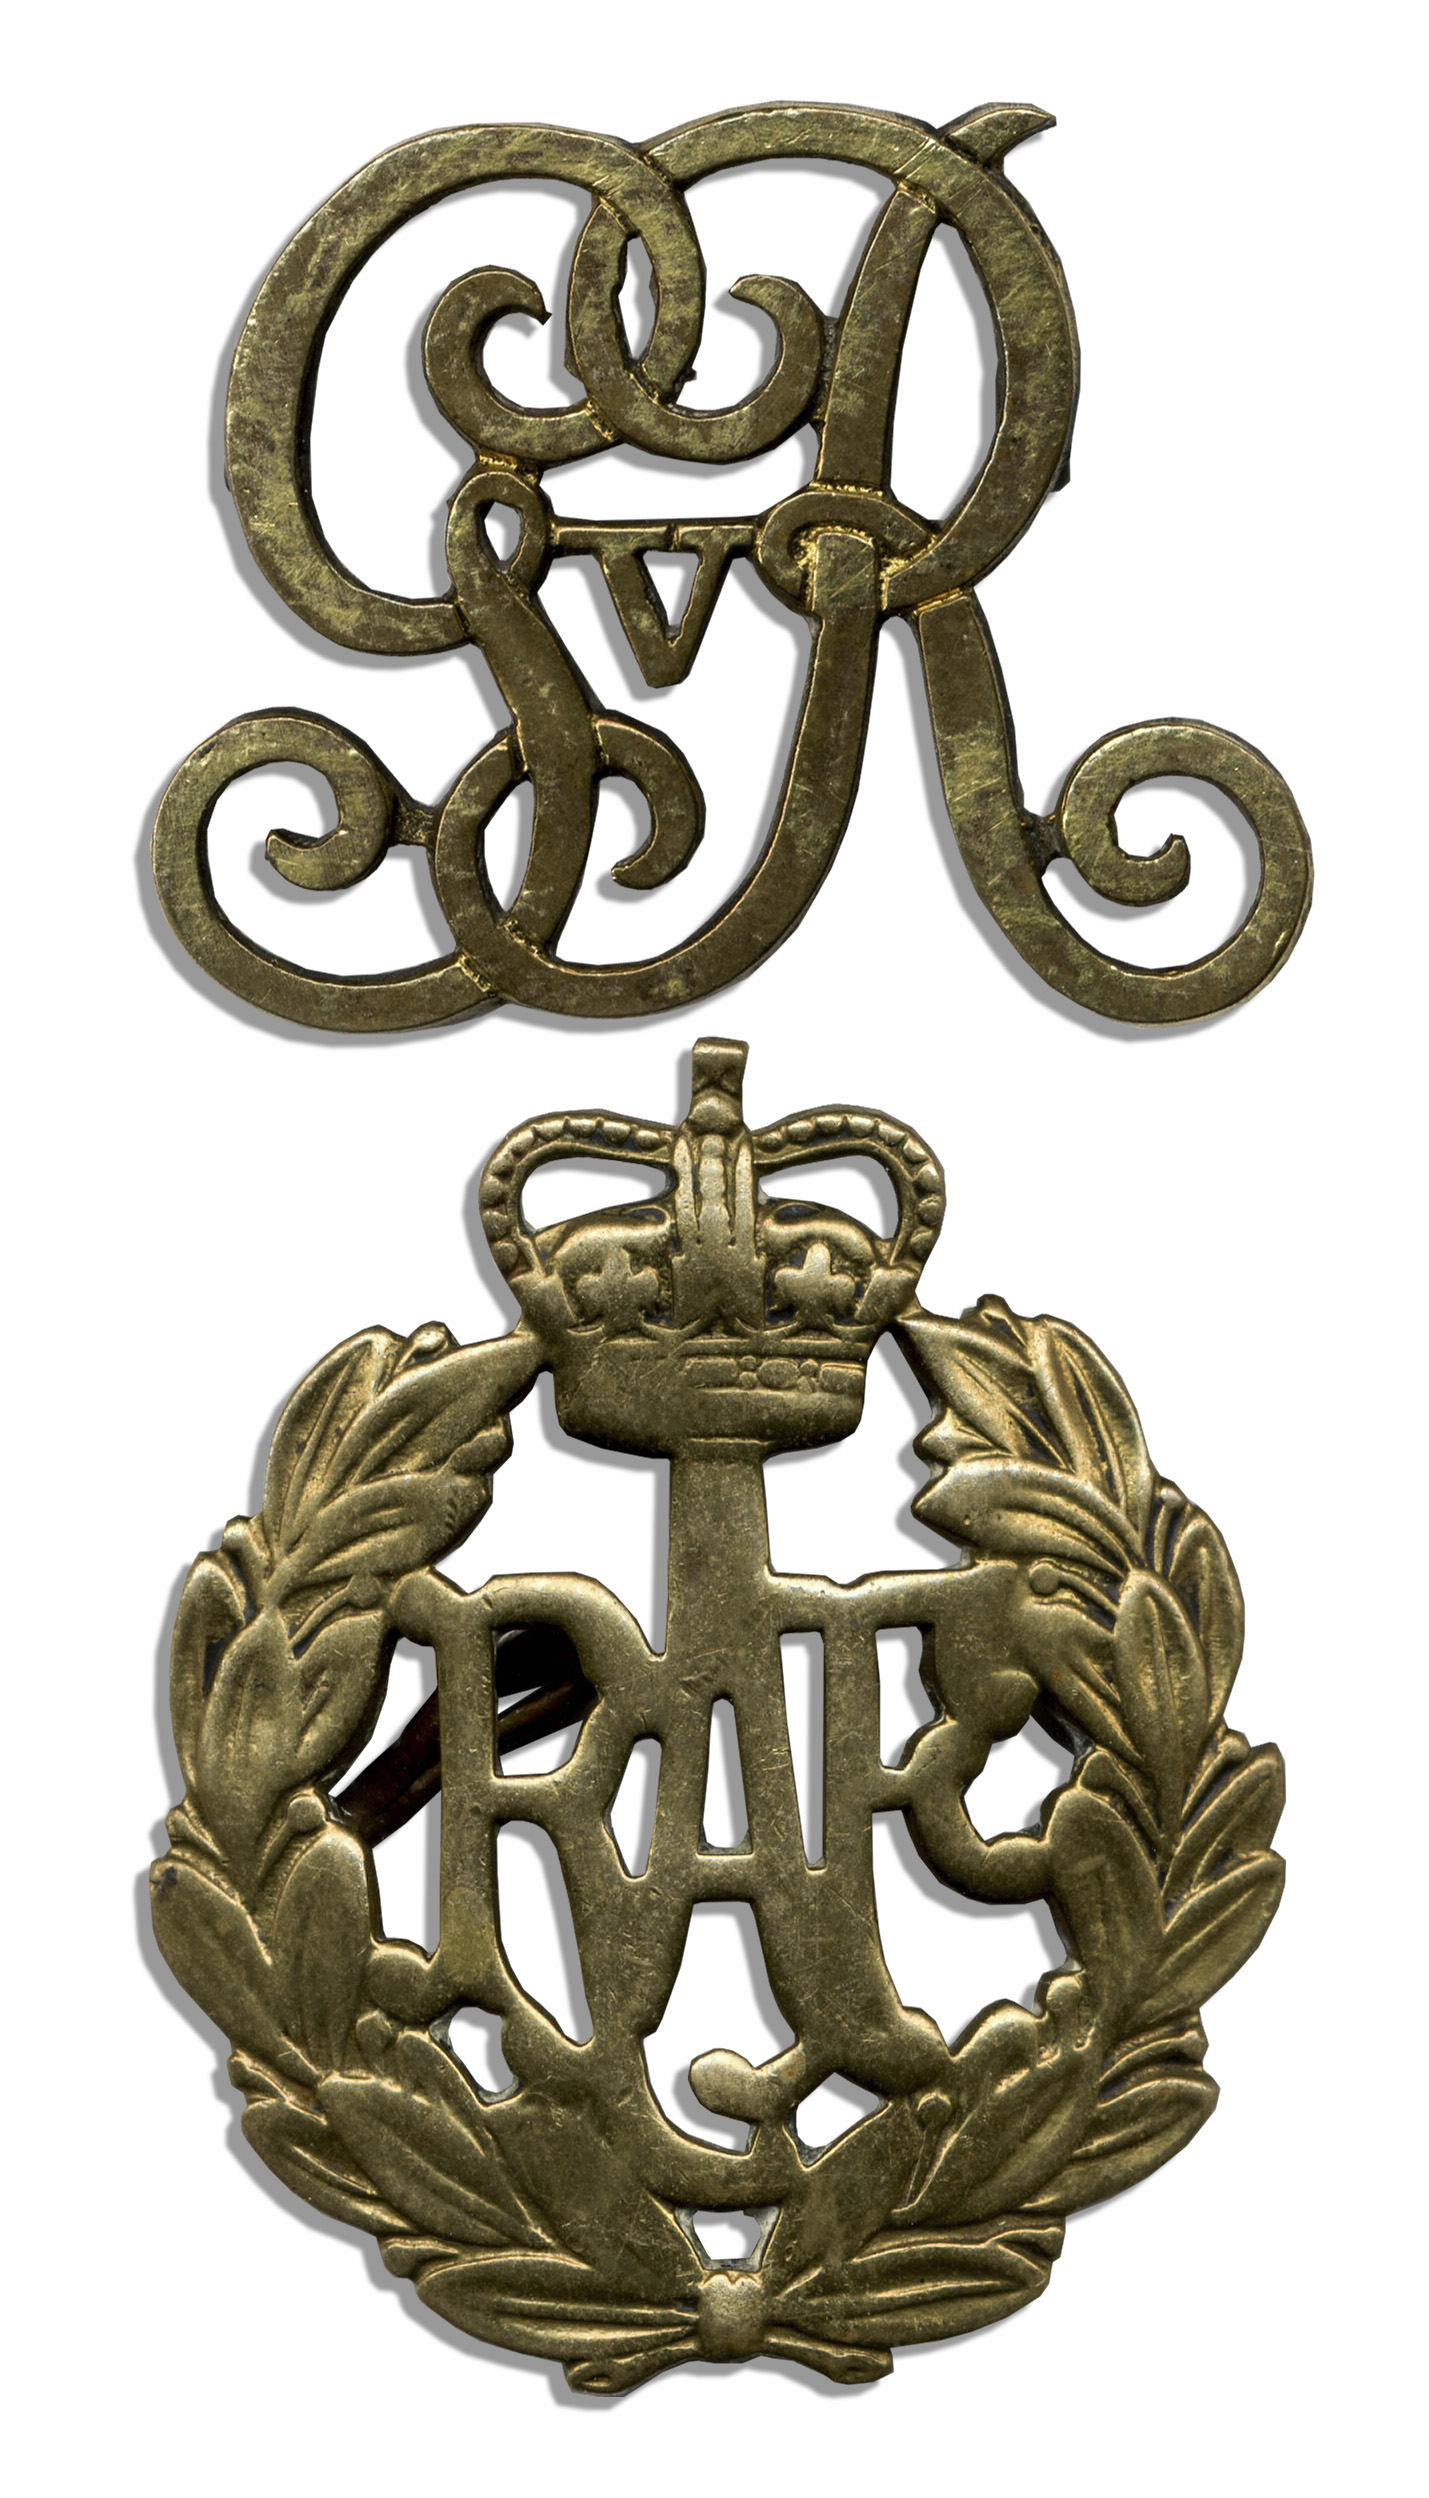 Two Royal British Commemorative Badges -- King George V Cypher & Royal ...: natedsanders.com/lot-32167.aspx